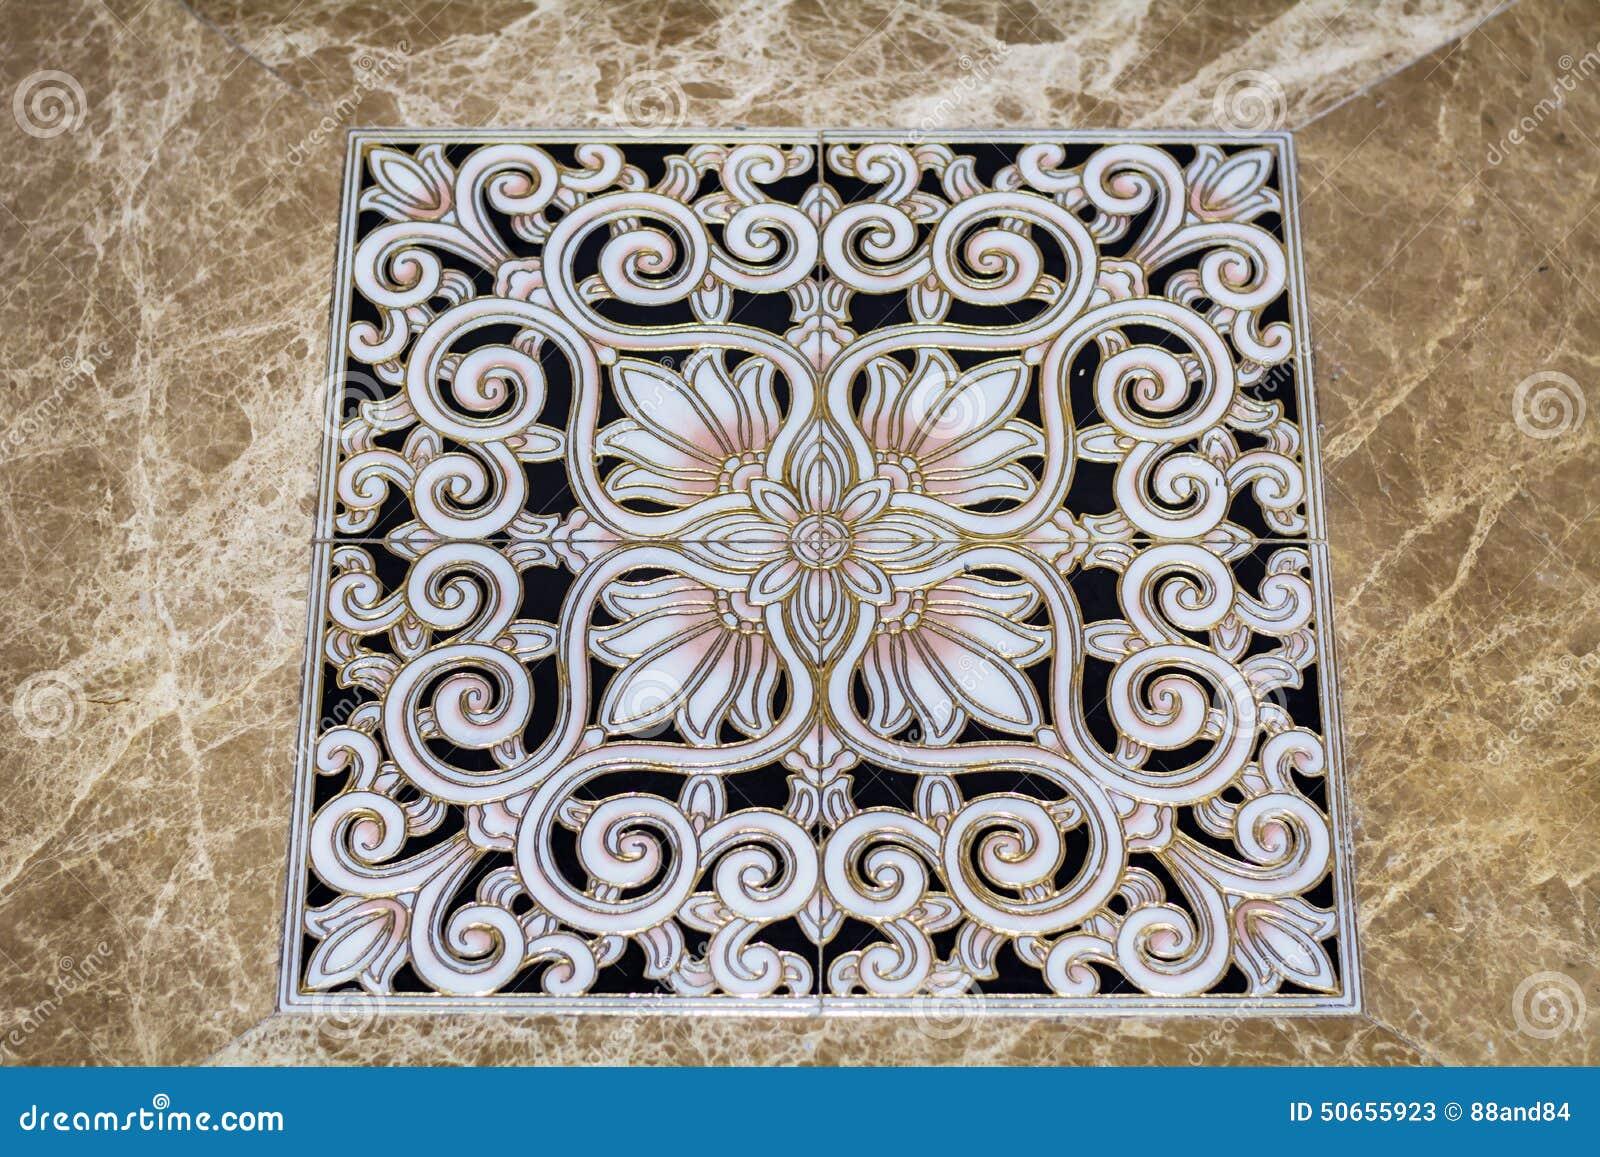 Antique Arabic Floor Tiles Stock Photo Image 50655923